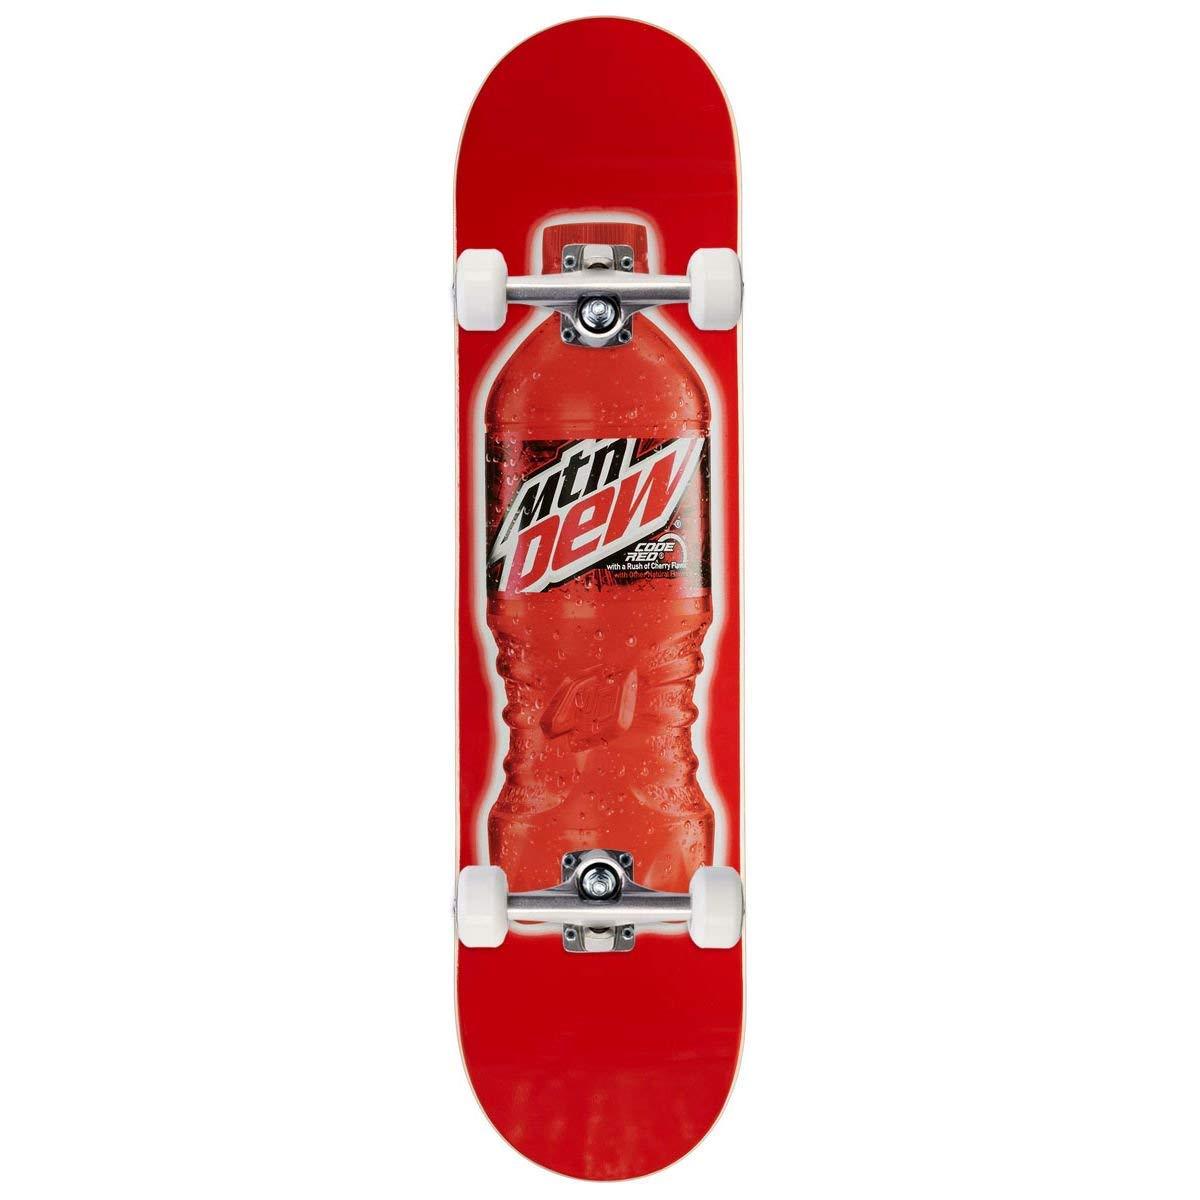 Amazon.com : CCS x Mountain Dew Bottle Skateboard Code Red Decks and ...